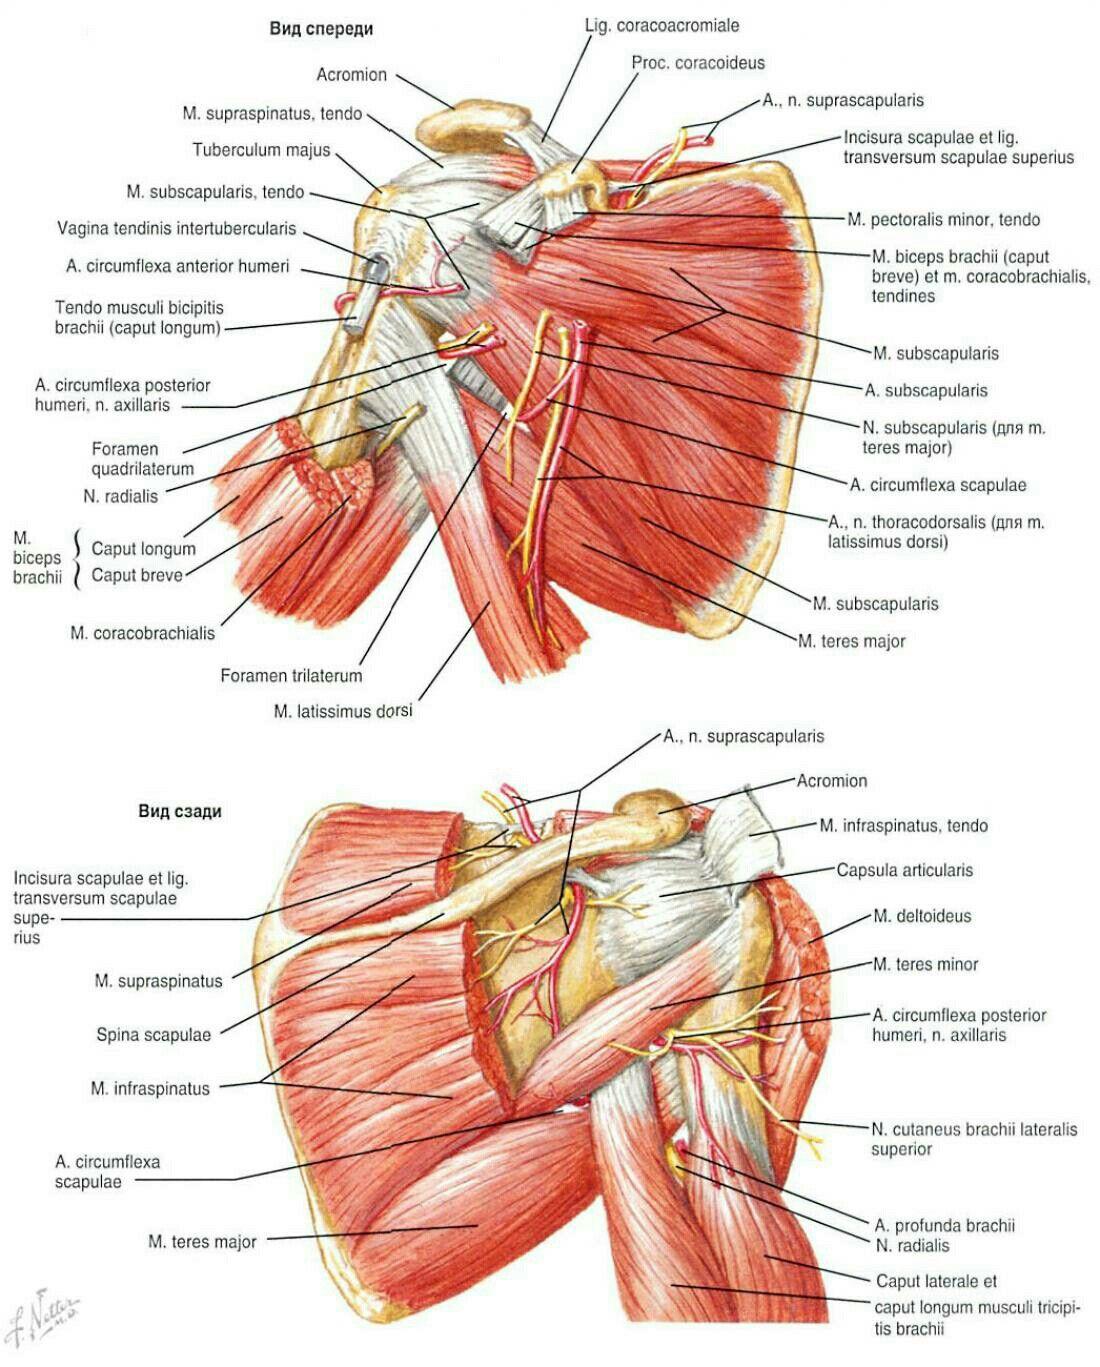 Pin by Ronald Hedblad on Kroppen | Pinterest | Anatomy, Rotator cuff ...